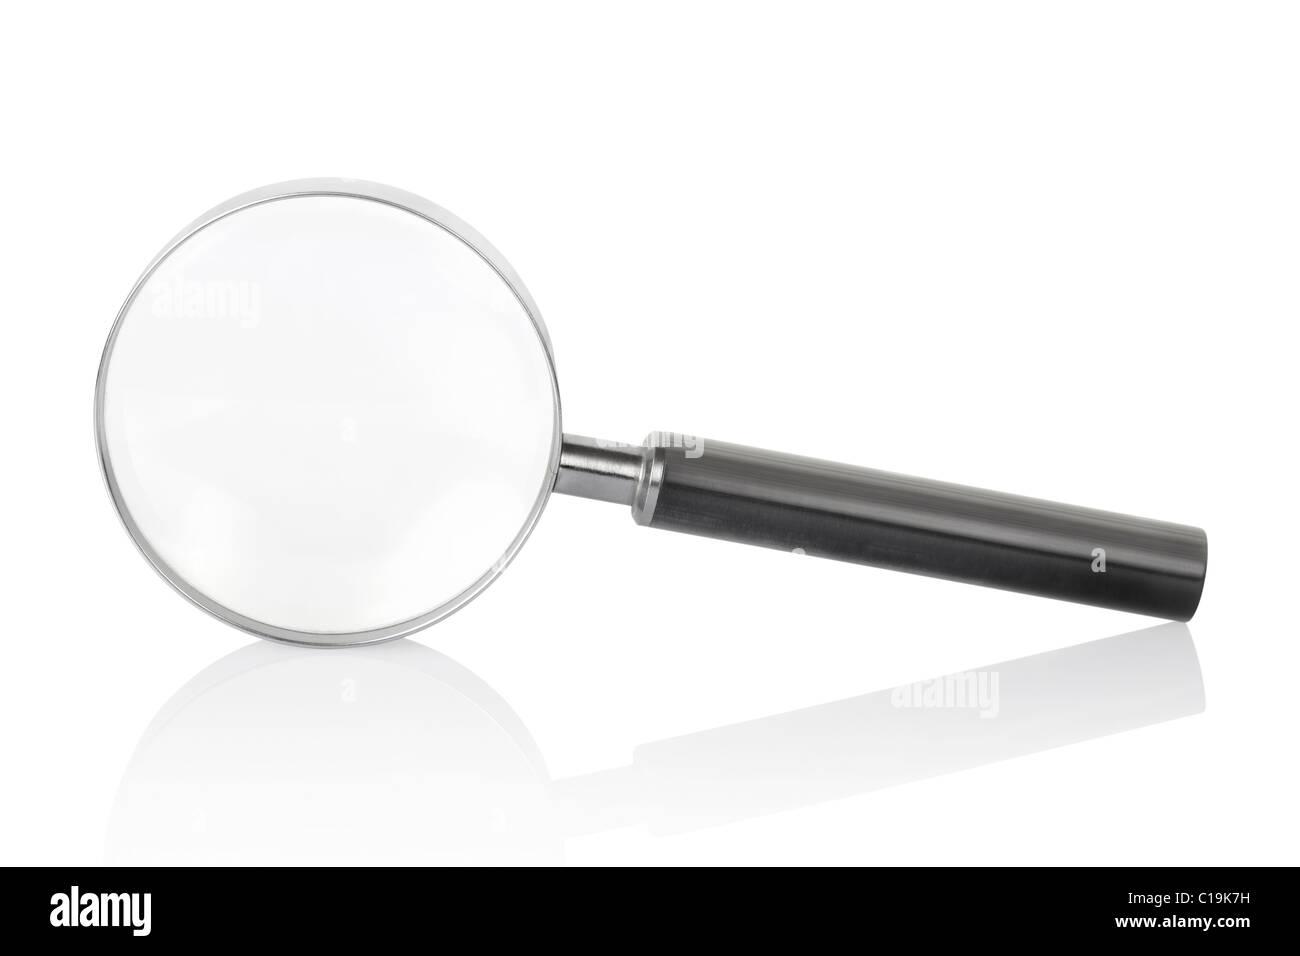 Magnifying glass isolated on white background - Stock Image